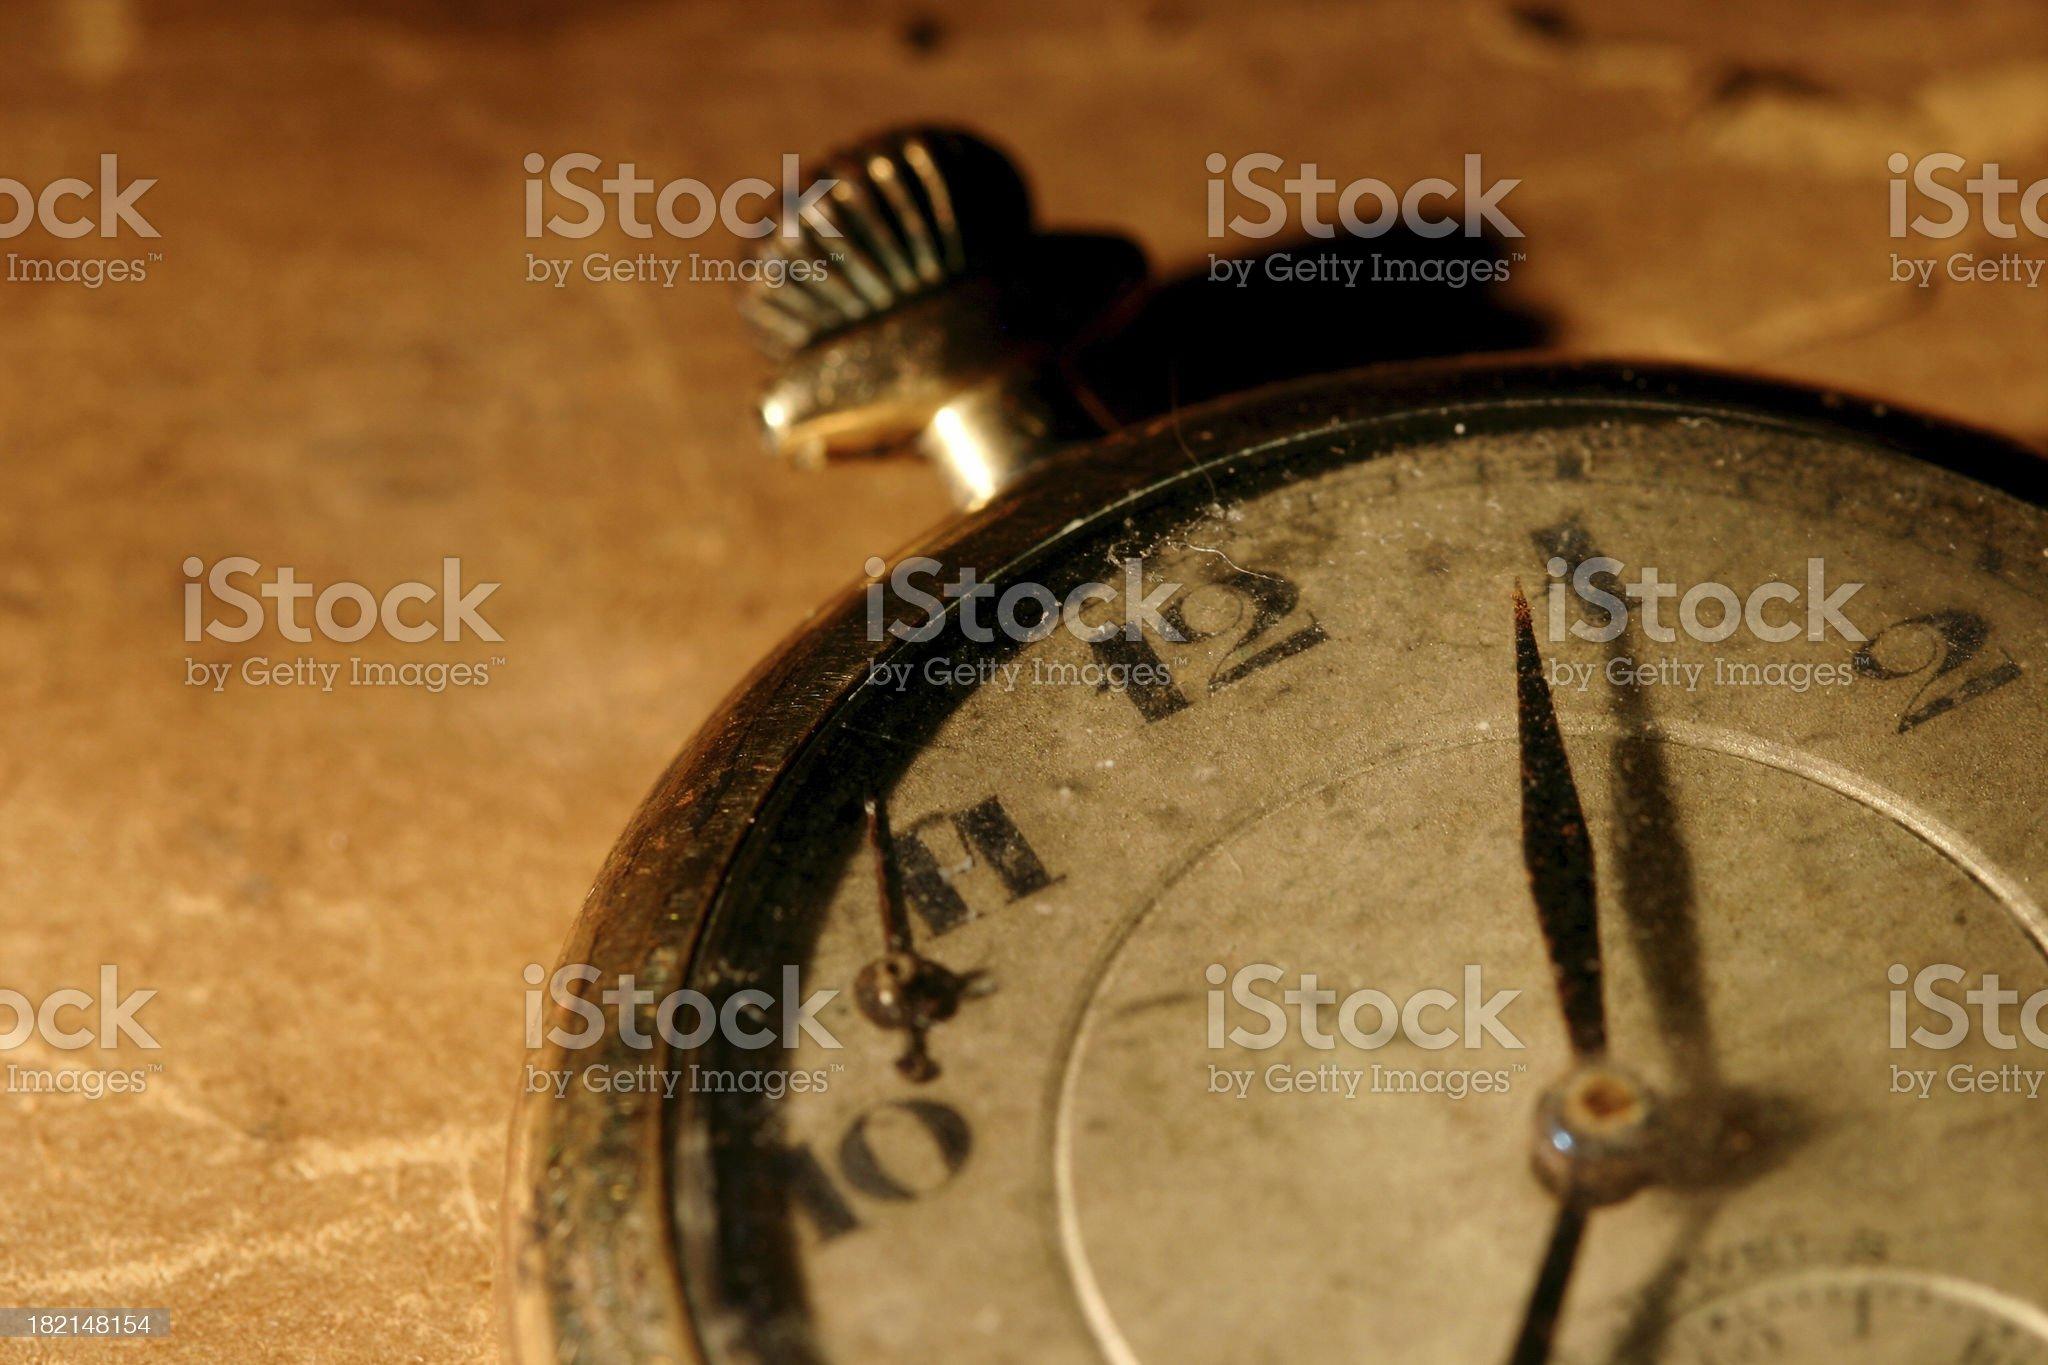 Antique Clock royalty-free stock photo